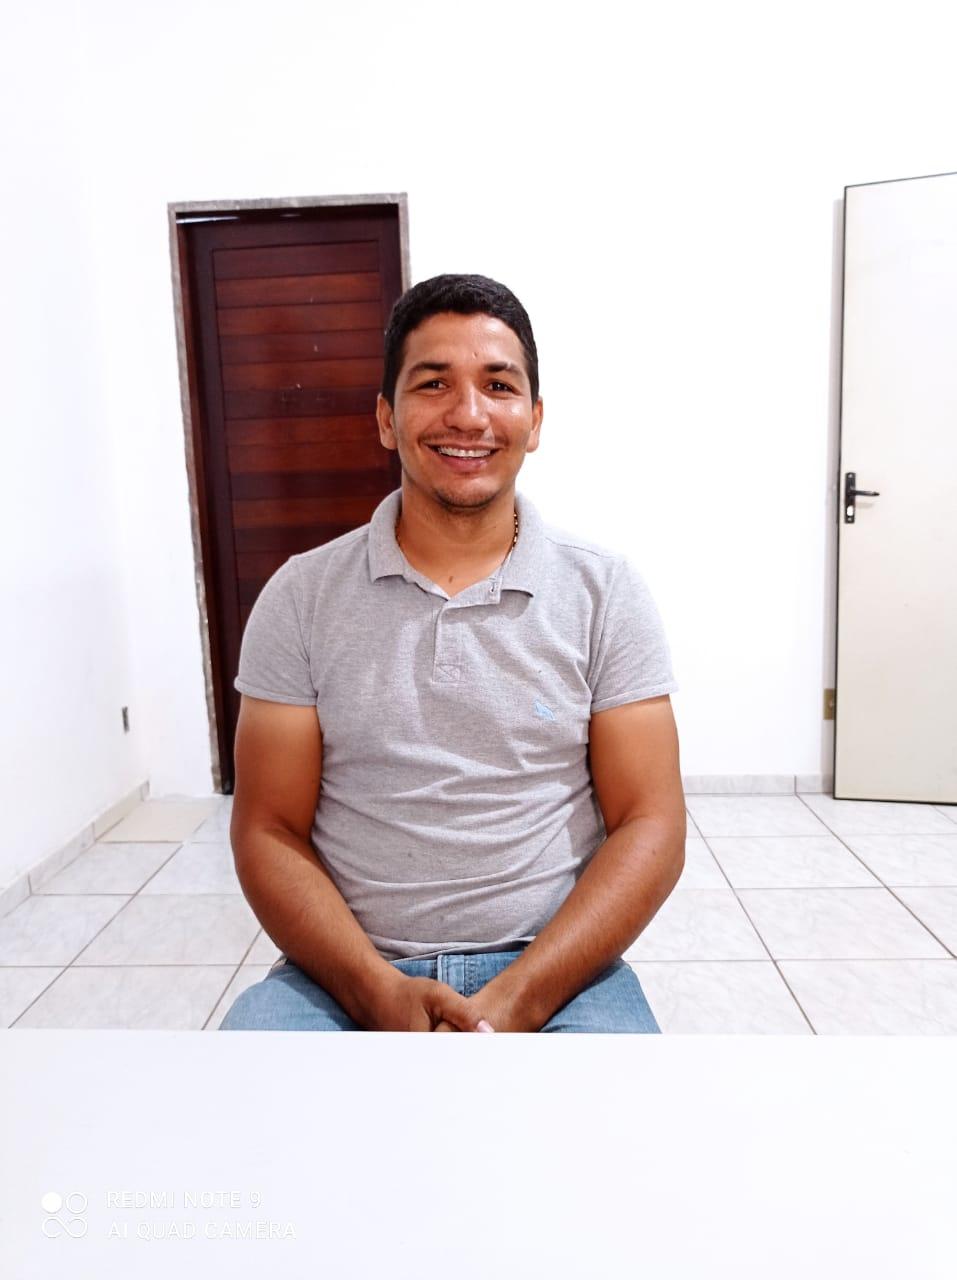 Gutembergue Pereira da Silva